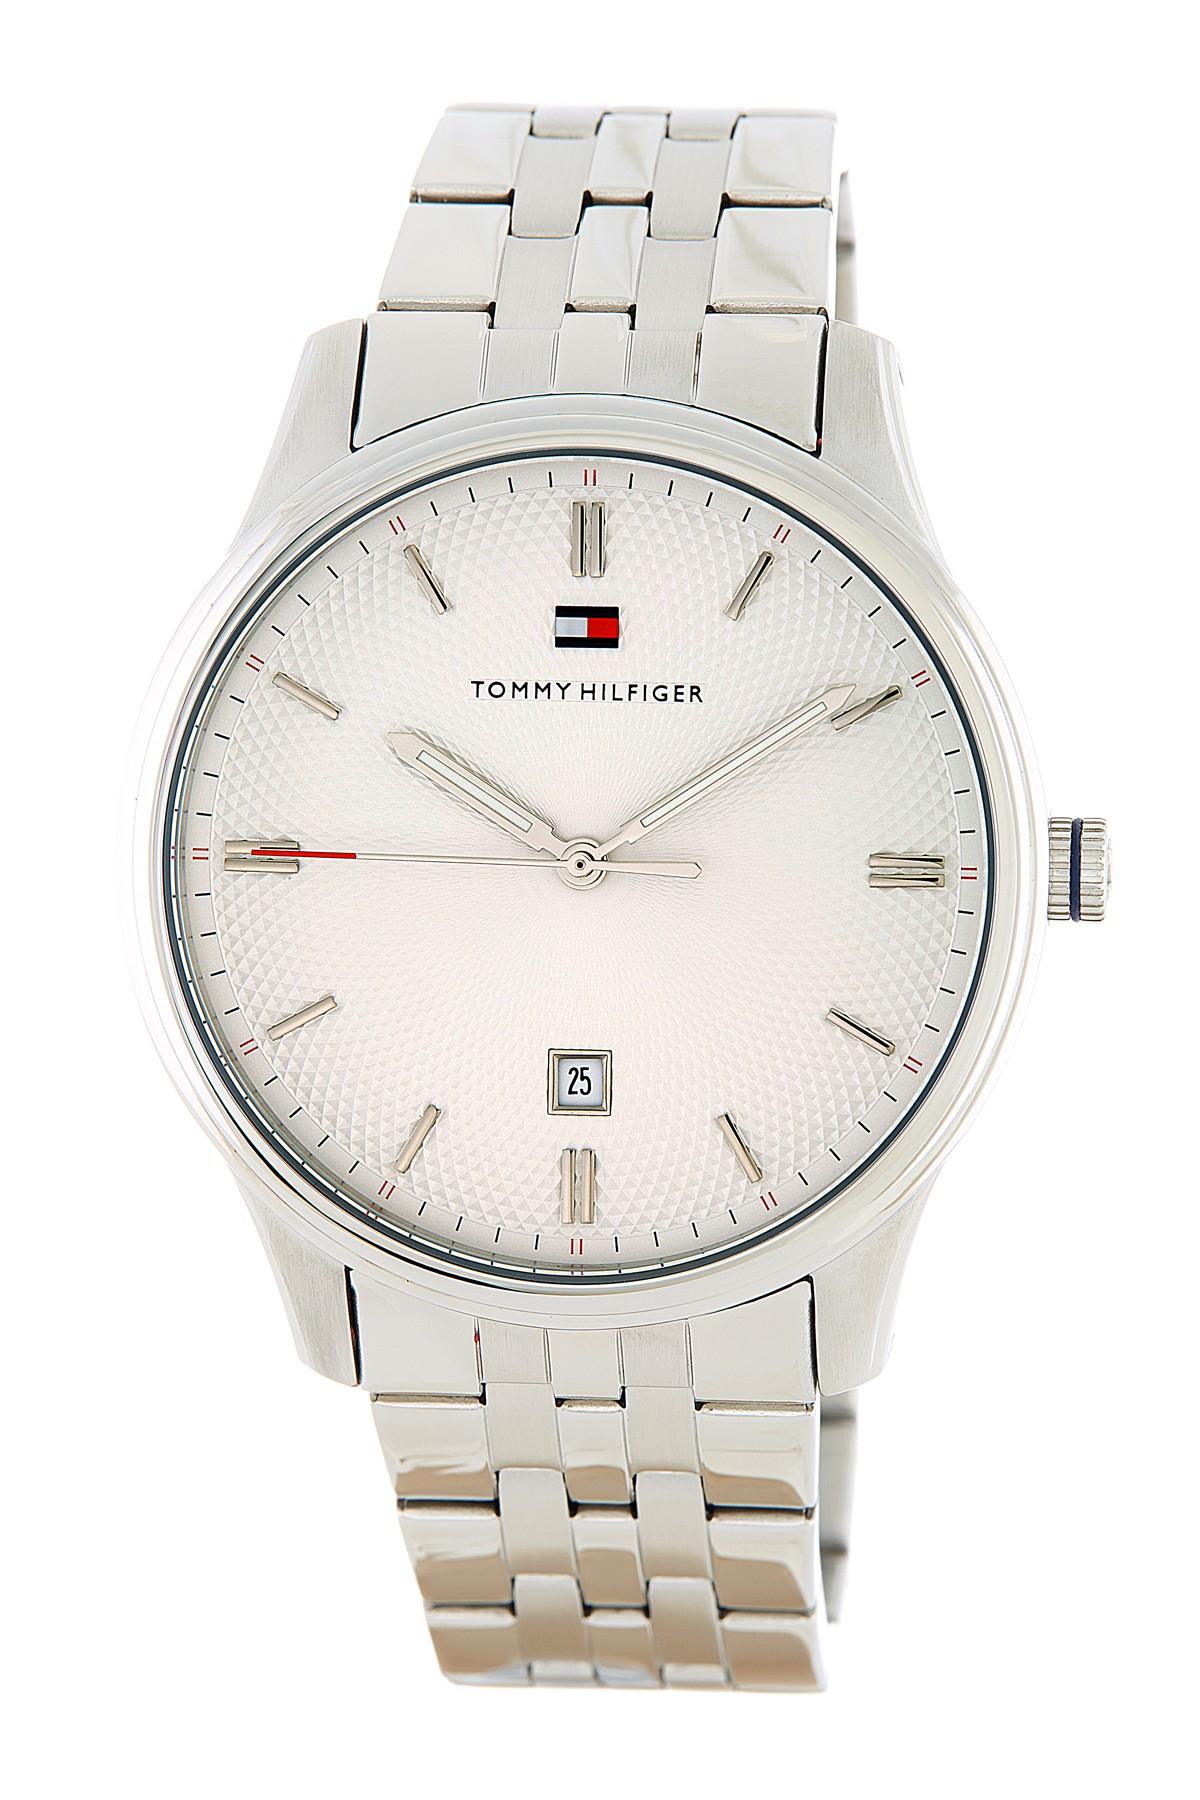 tommy hilfiger men 39 s andre classic bracelet watch in multicolour for men no color save 50. Black Bedroom Furniture Sets. Home Design Ideas